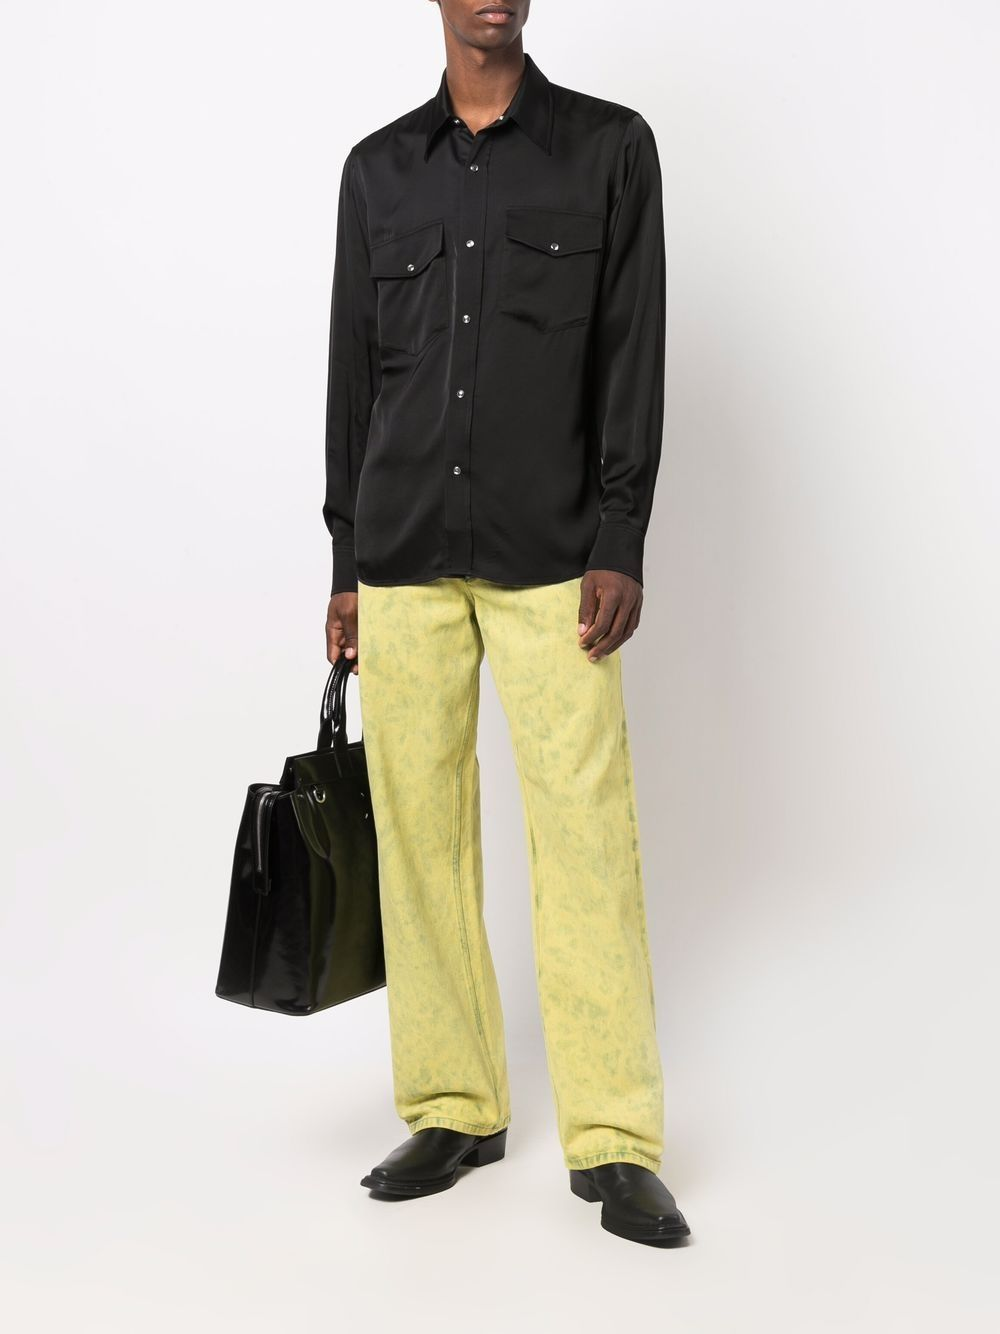 curnes shirt man black in viscose DRIES VAN NOTEN   Shirts   CURNES 3159900